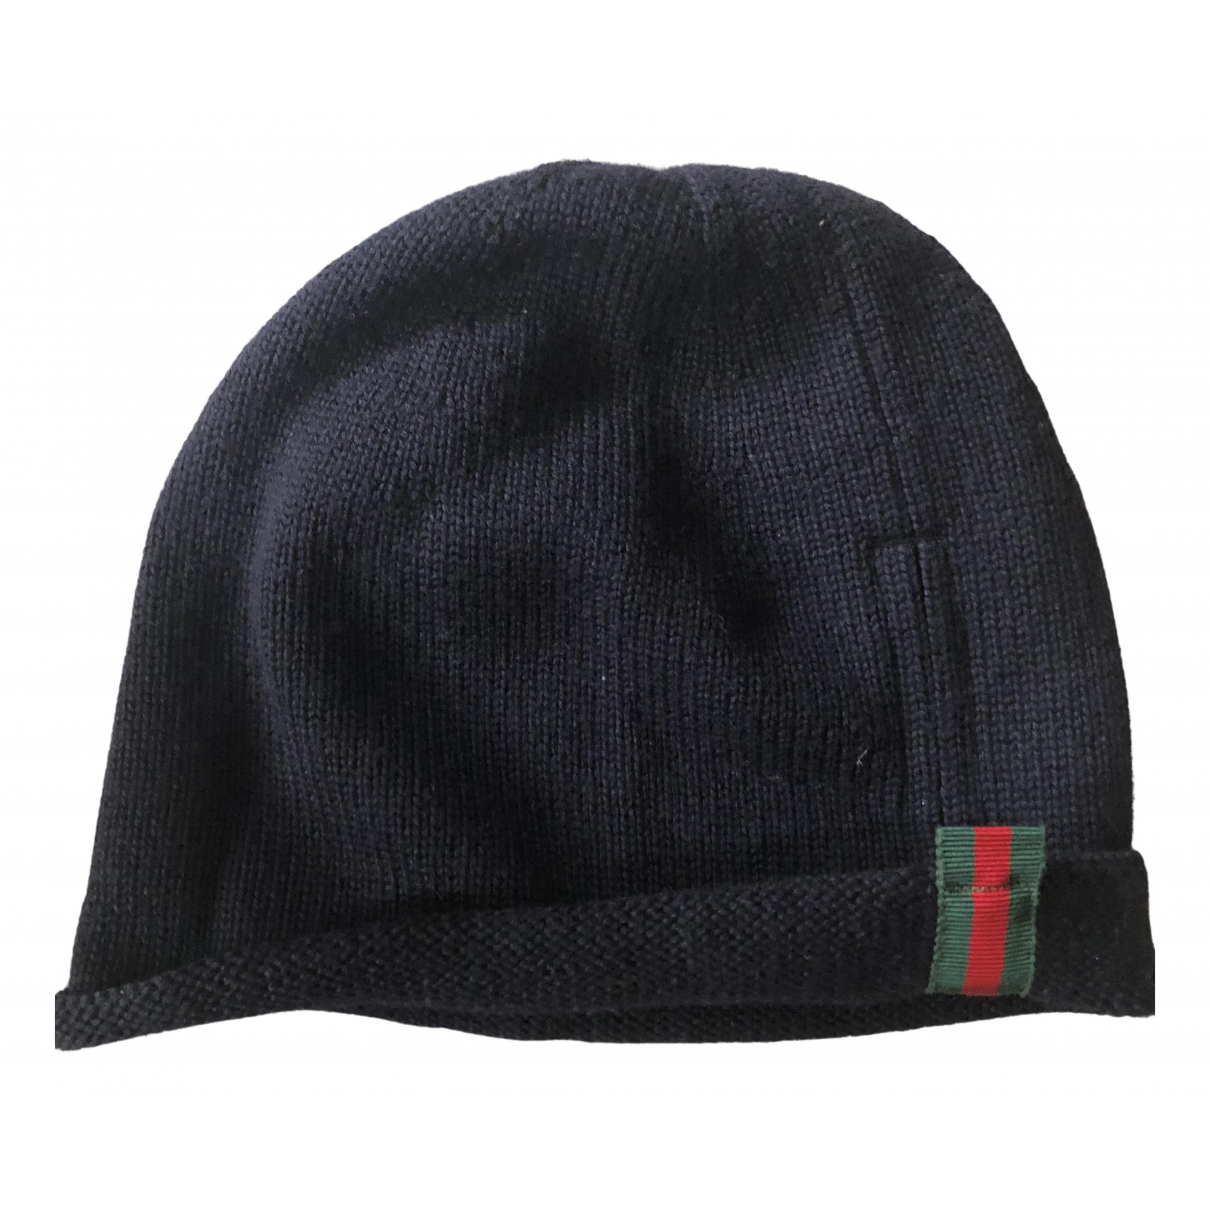 Gucci \N Blue Wool hat for Women S International